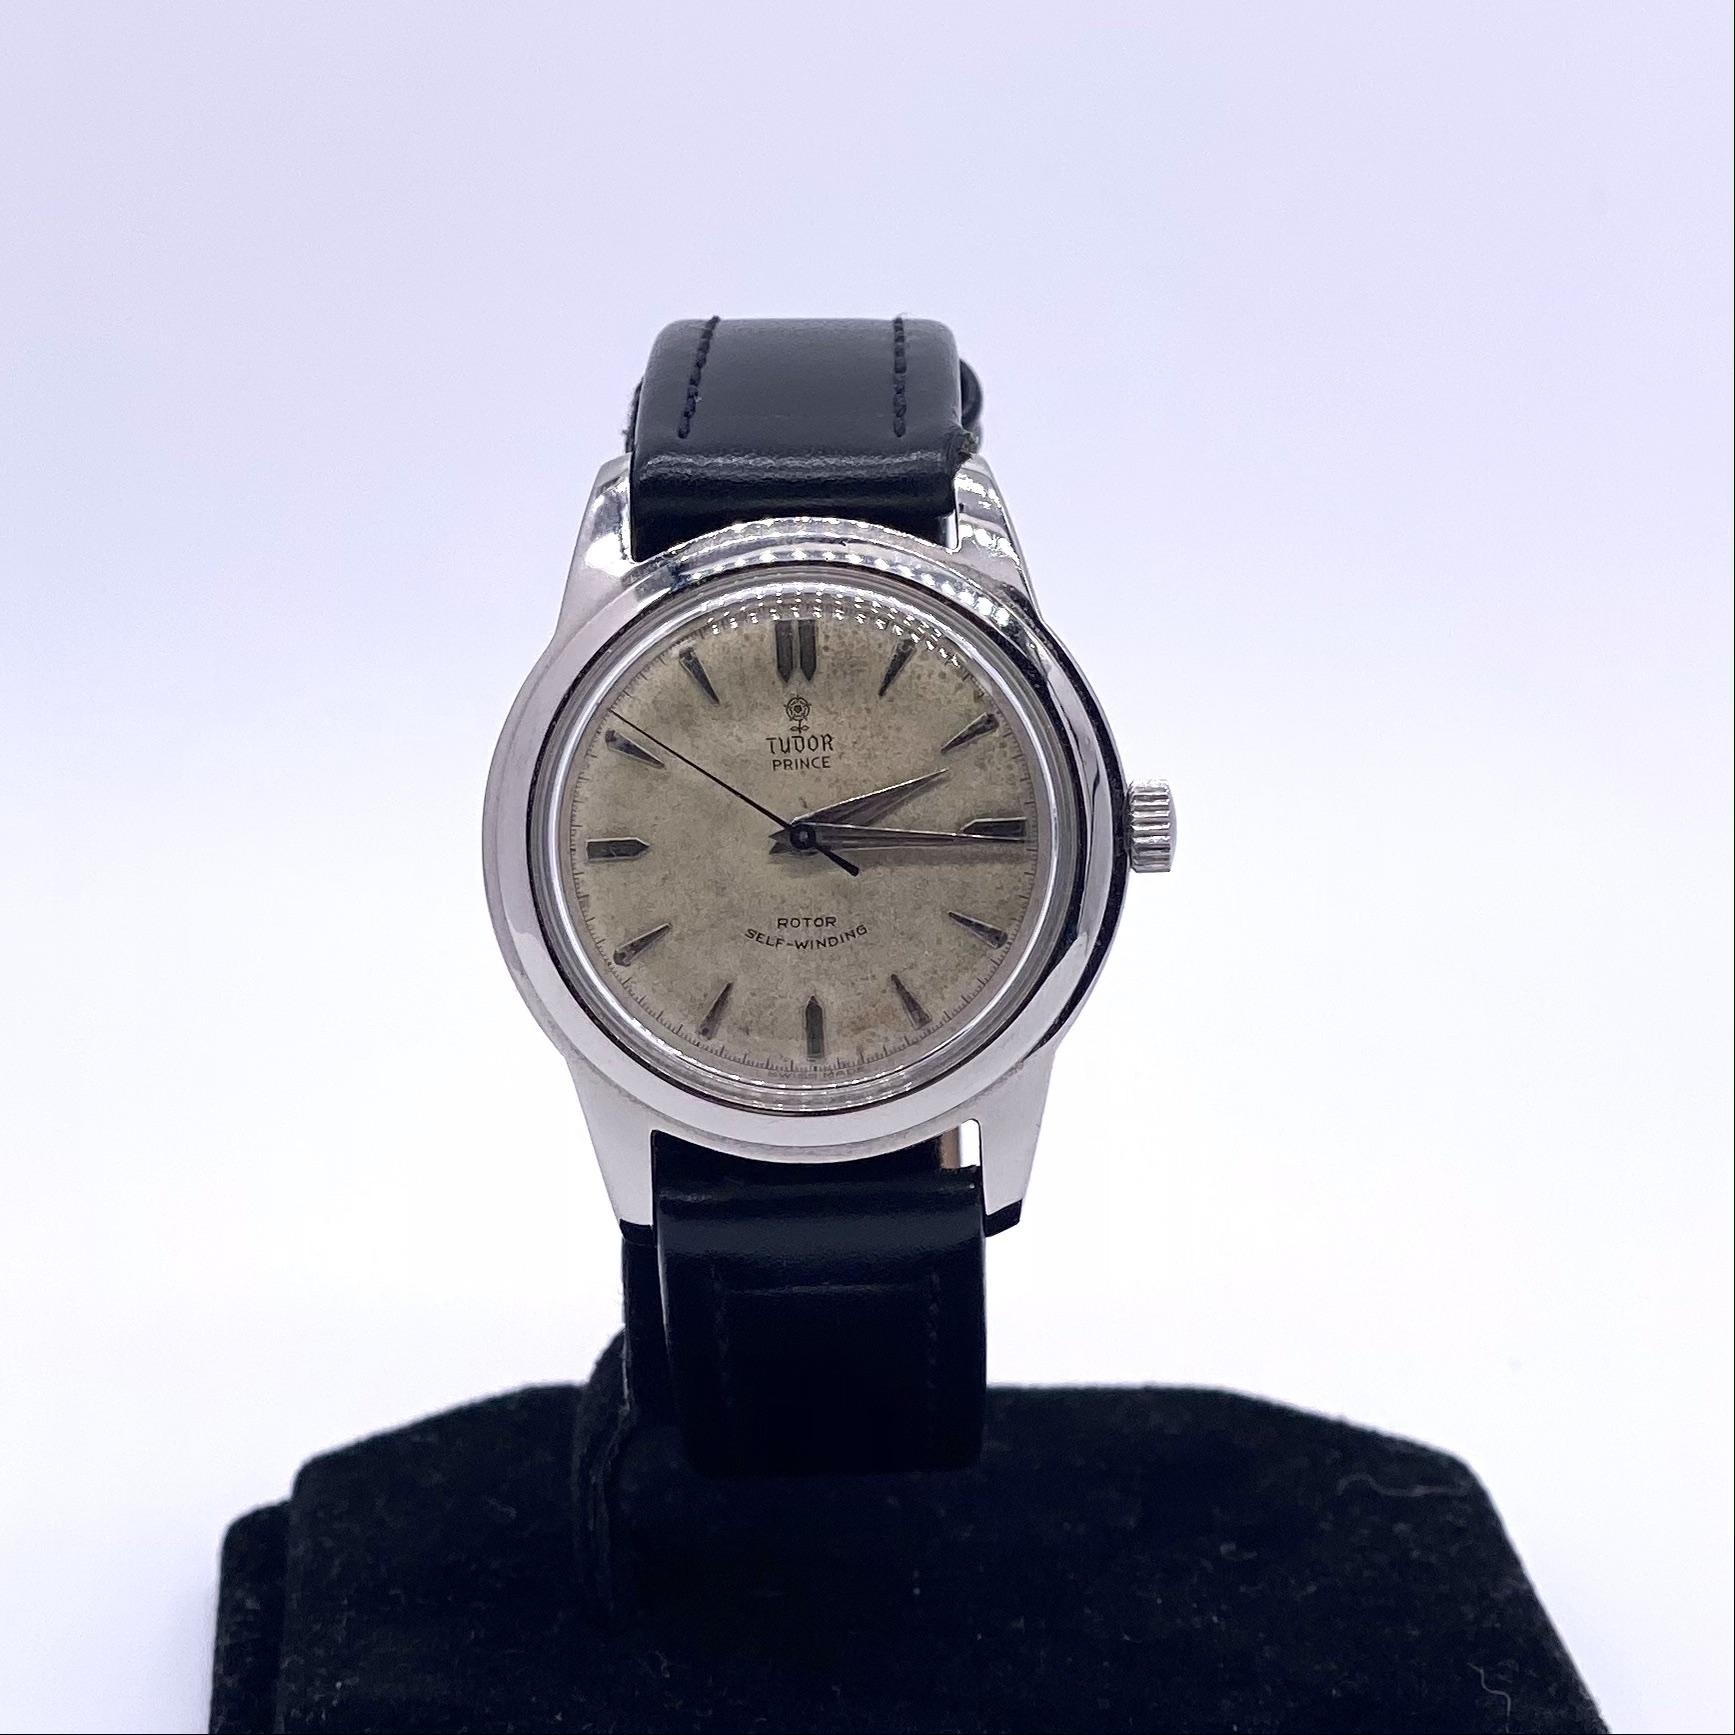 Tudor Prince Vintage Automatic Watch ref 1431